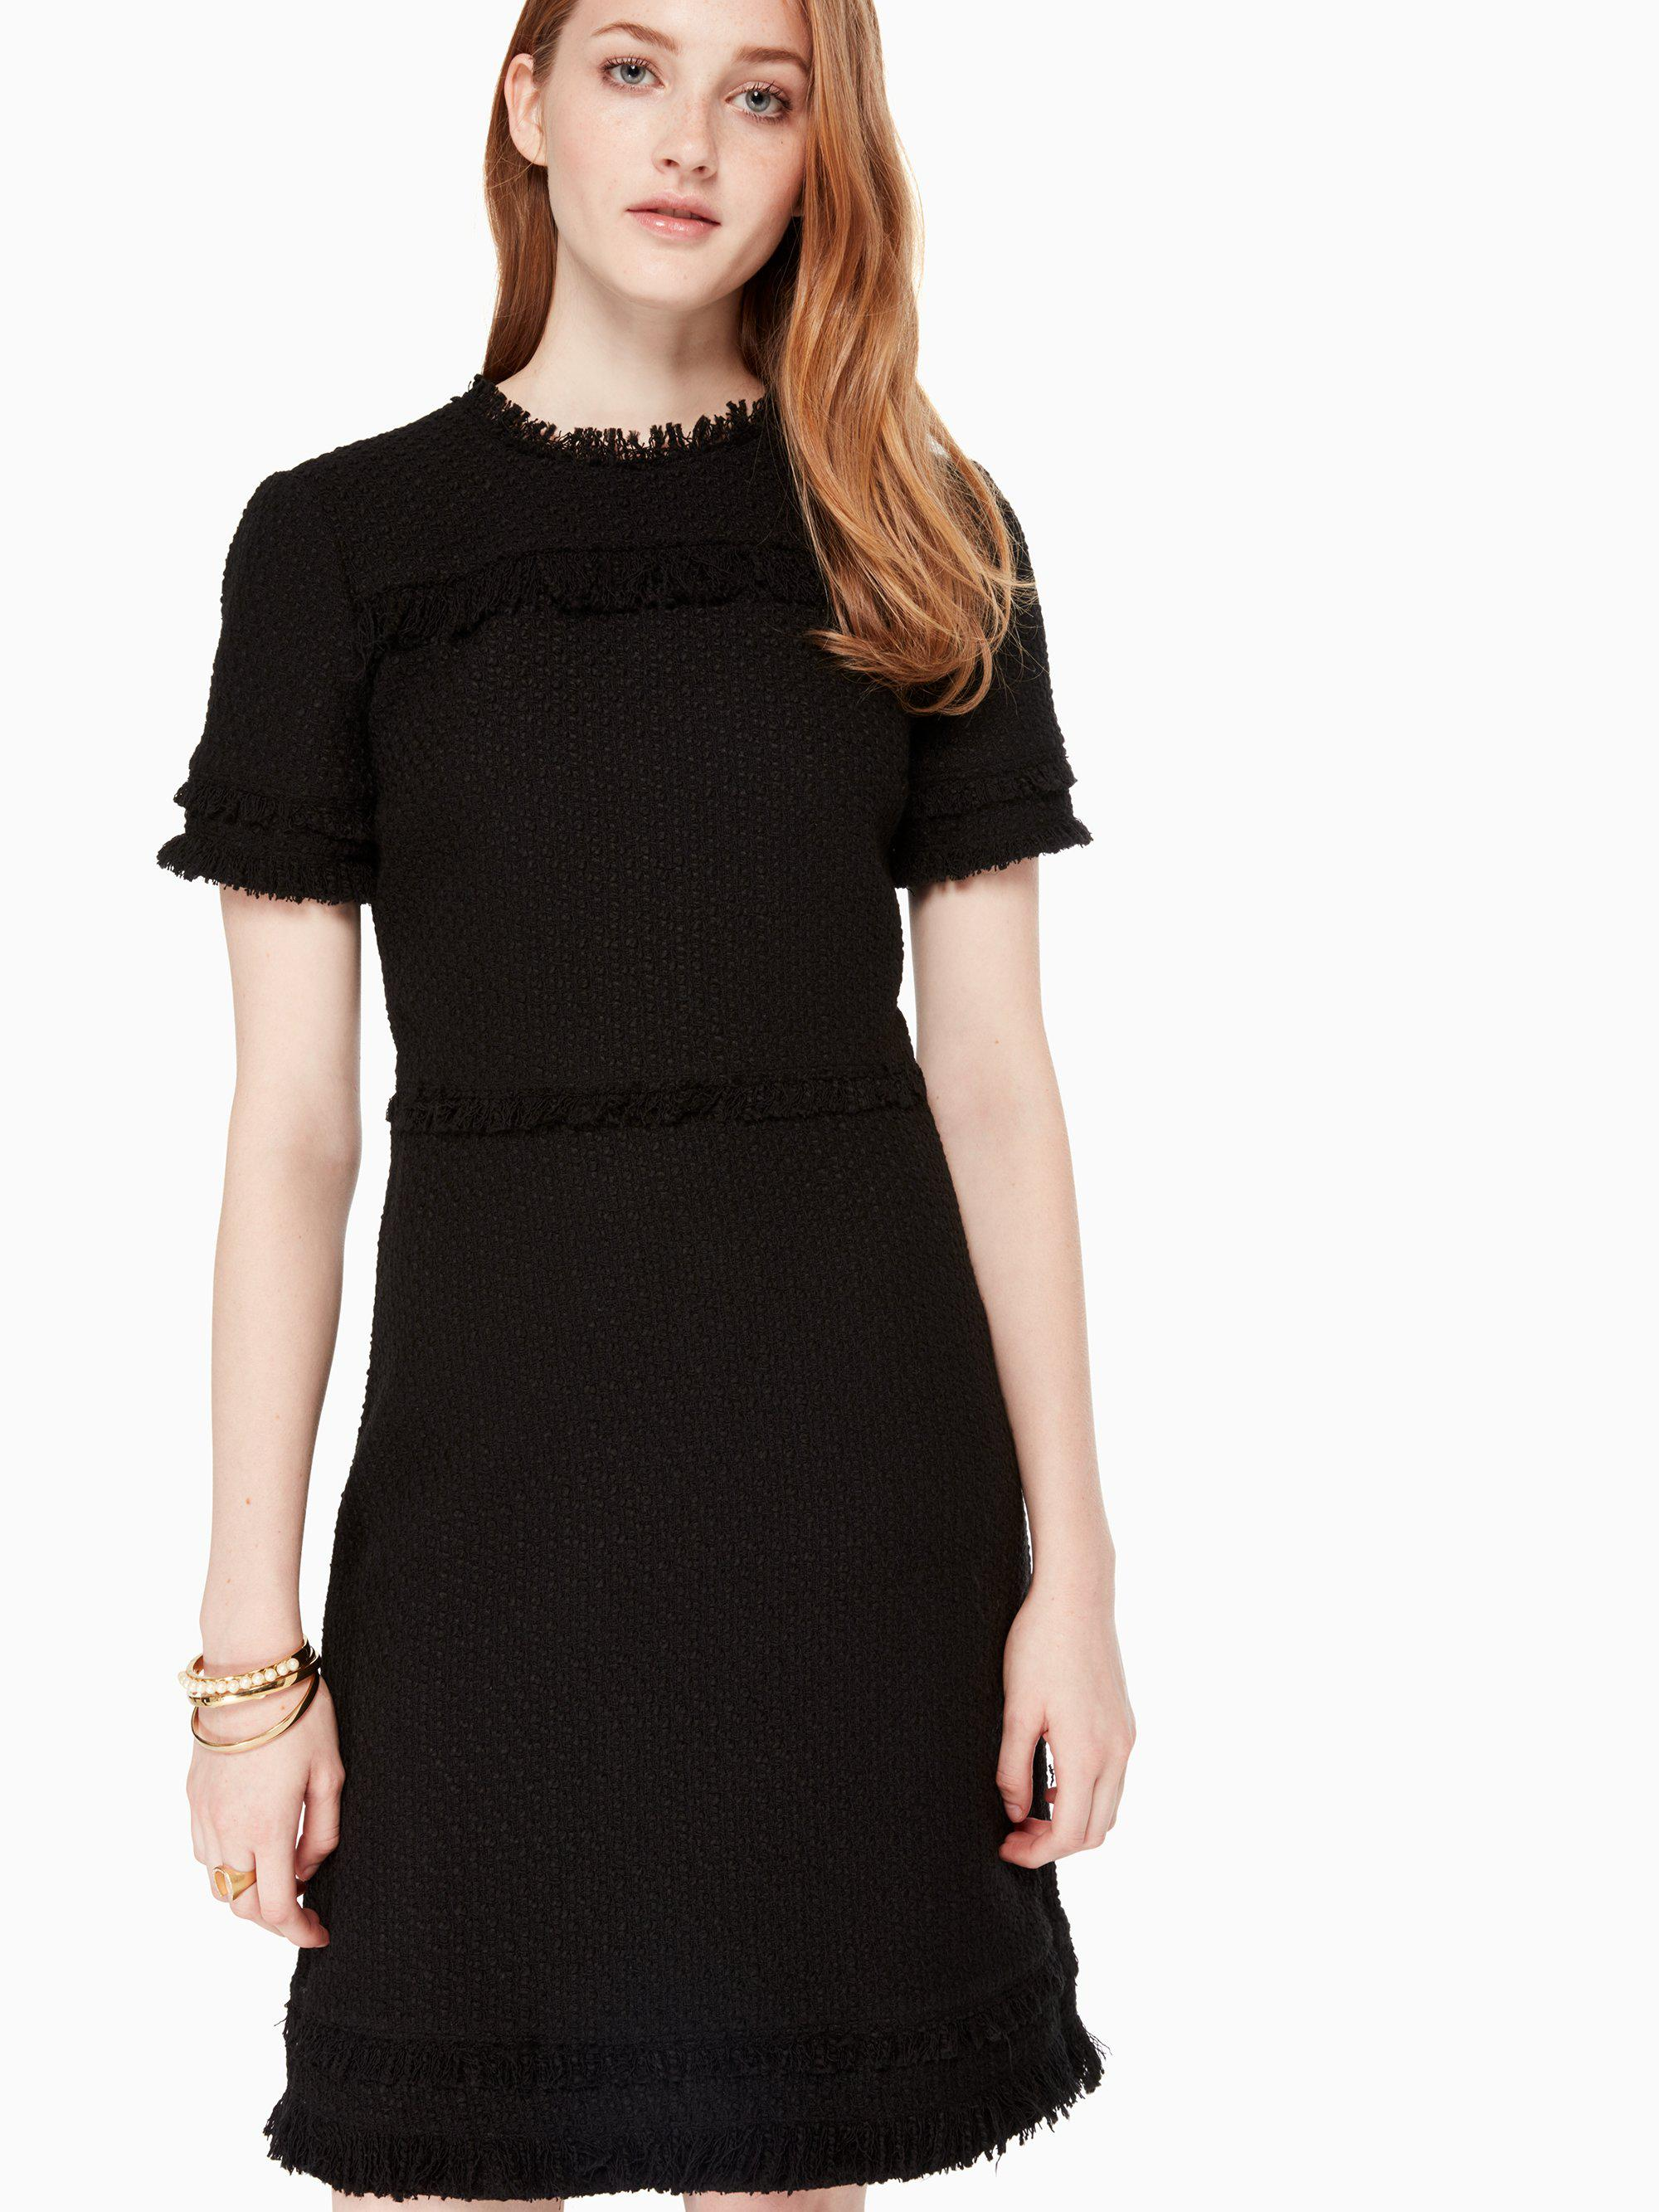 e4ef2fc1fdc6e Kate Spade Western Tweed Dress in Black - Save 30% - Lyst